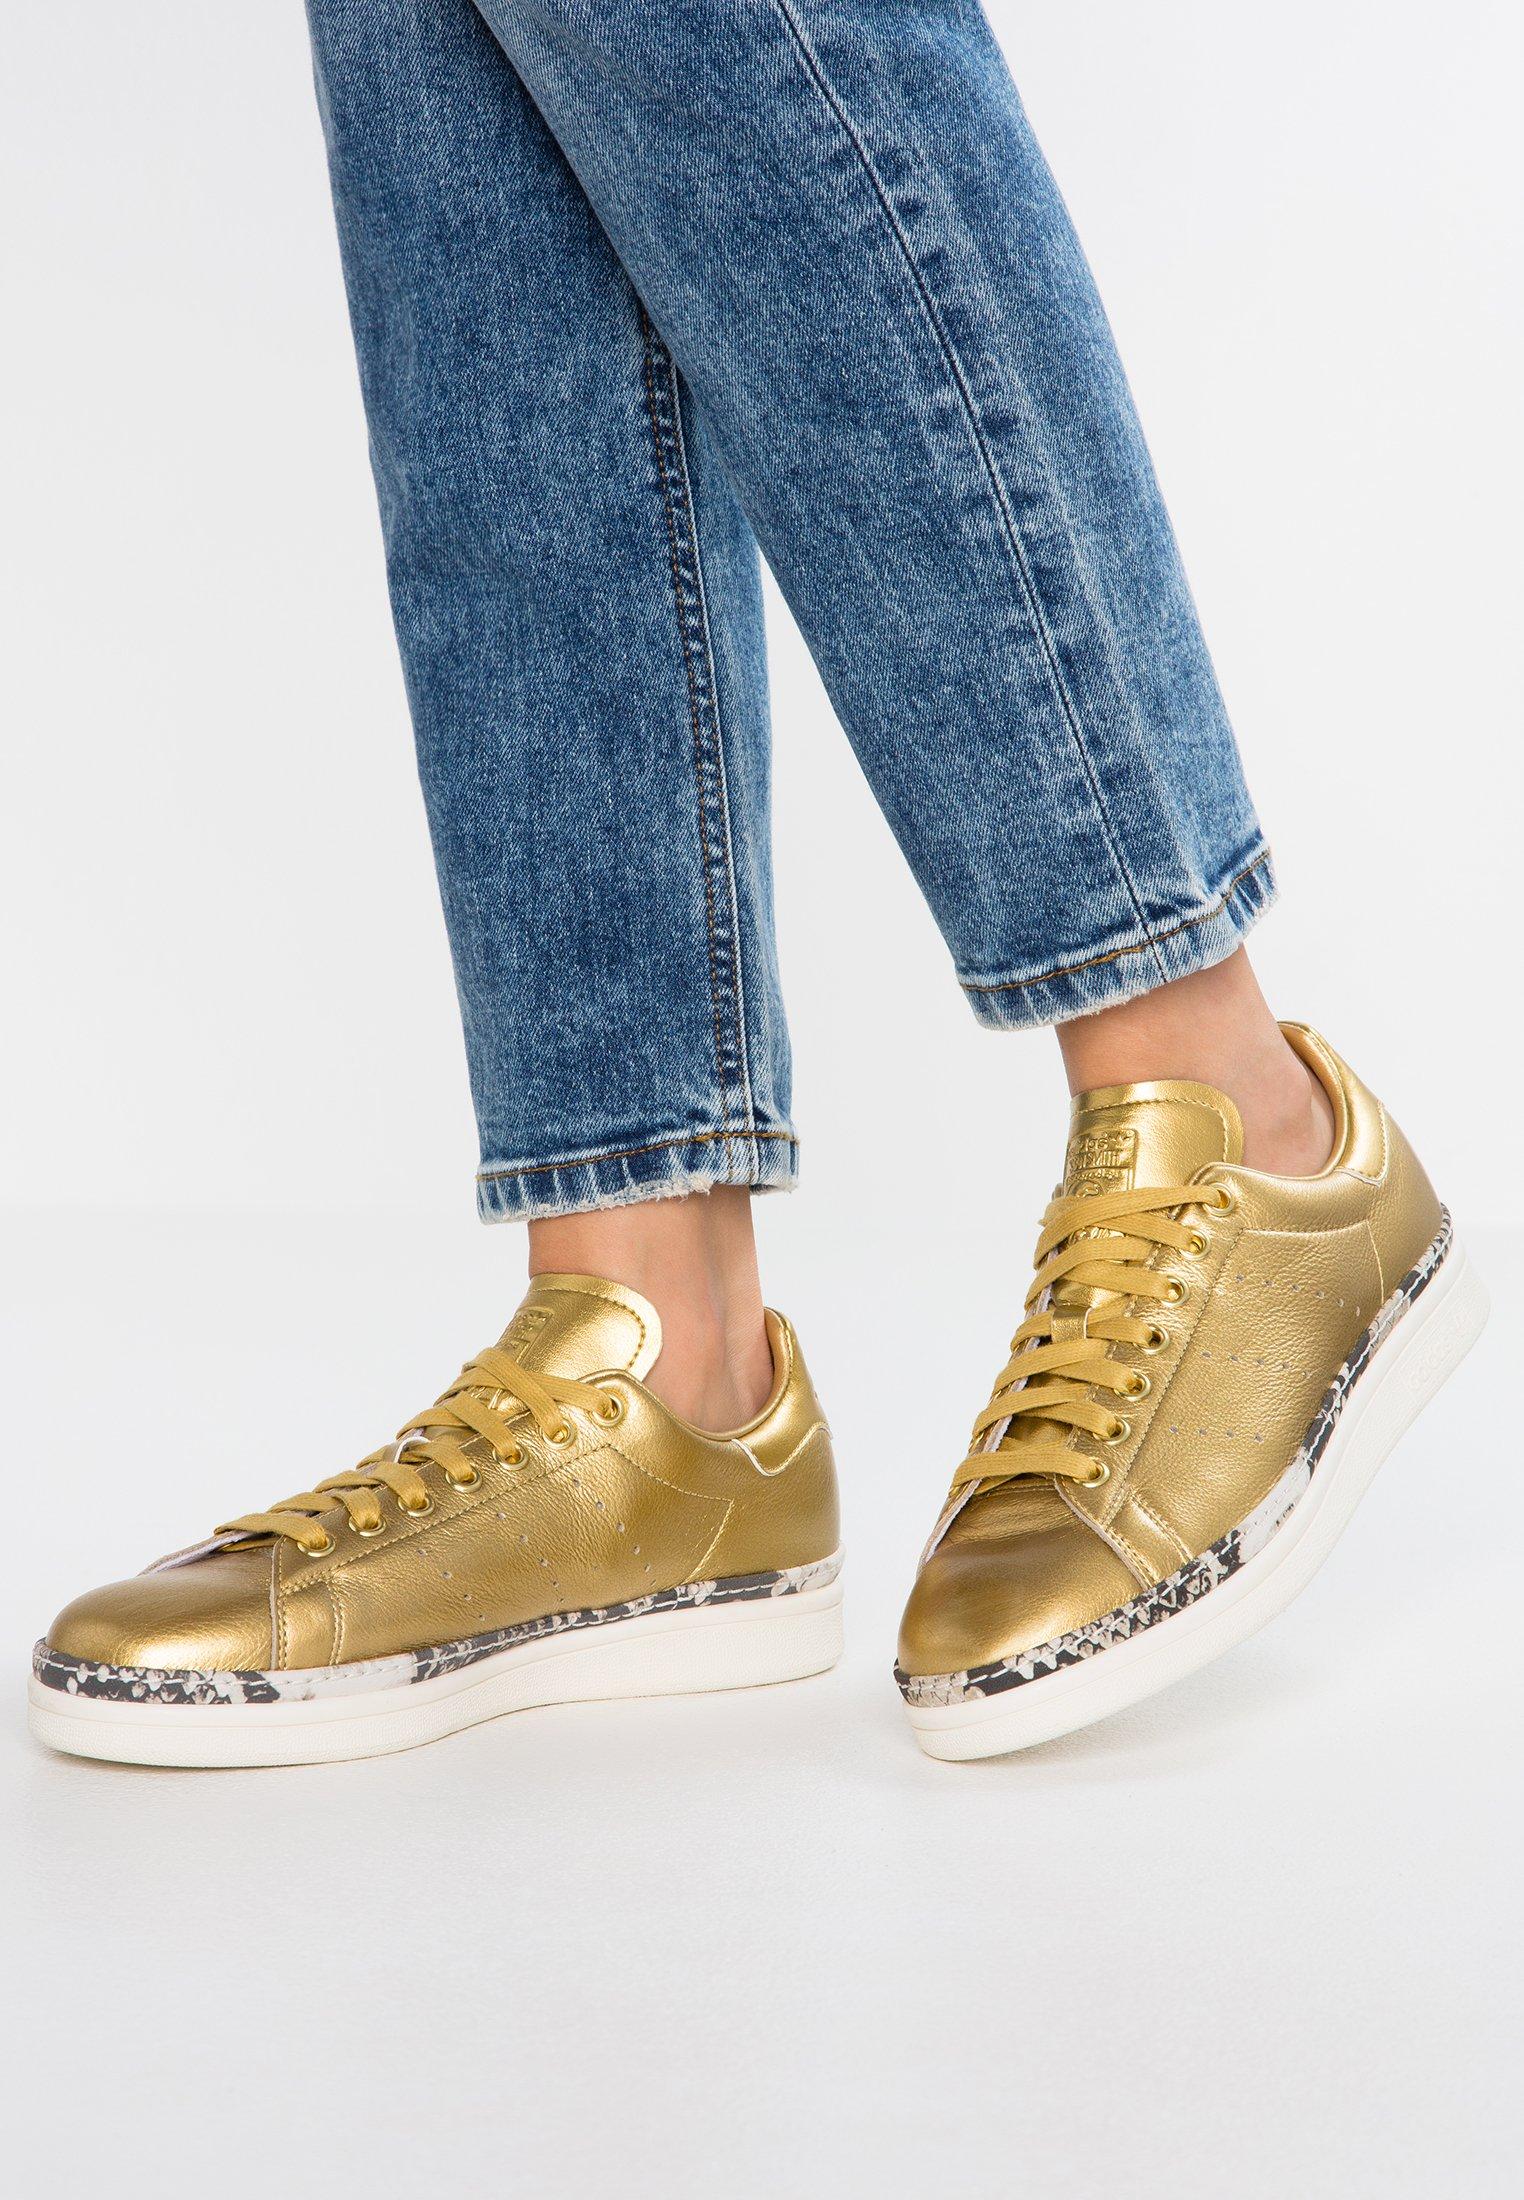 Stan Basses Smith Gold BoldBaskets Metallic Adidas Originals New offwhite rCeWdxBoEQ